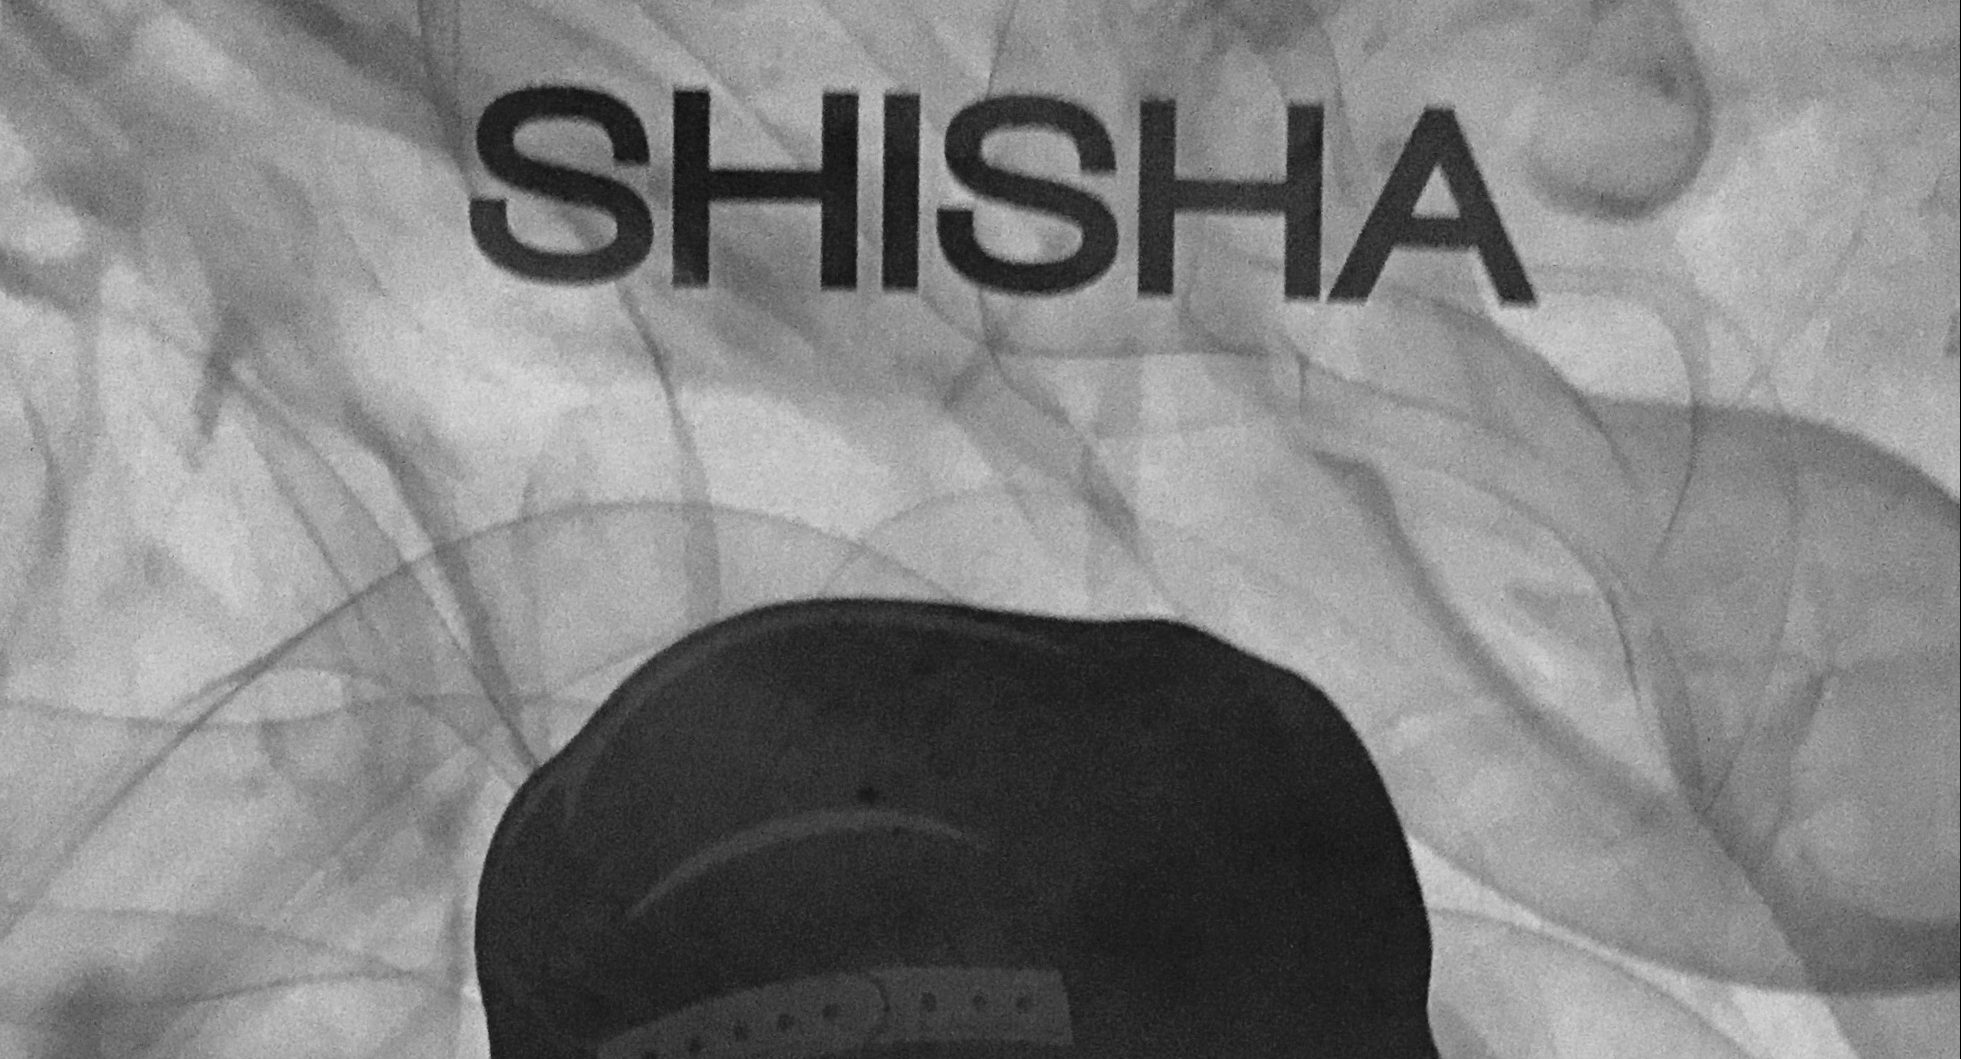 Shishabar Lippstadt - Hotels, Pensionen, Apartments Lippstatd in der Nähe der Innenstadt